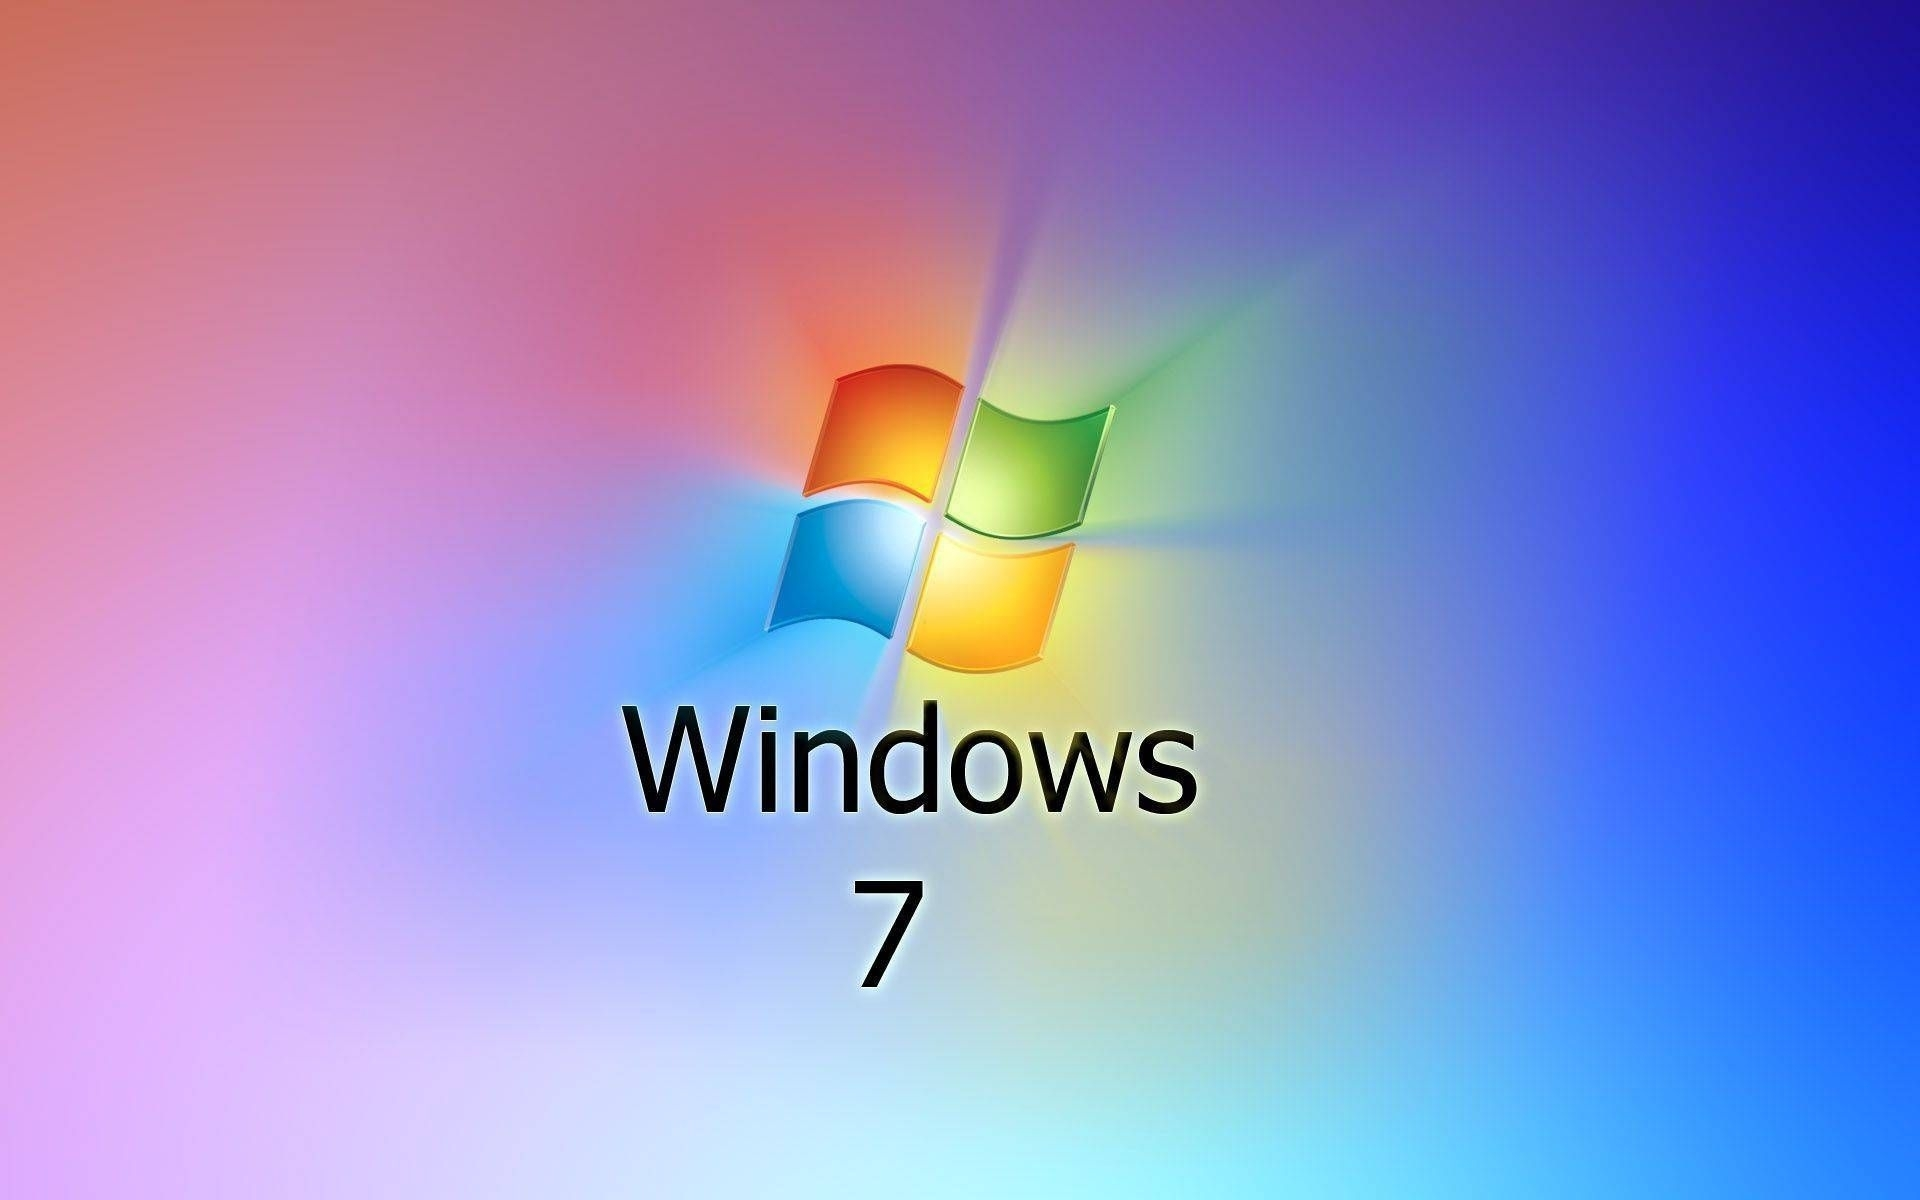 technology windows 7 upgrade your life wallpapers (desktop, phone